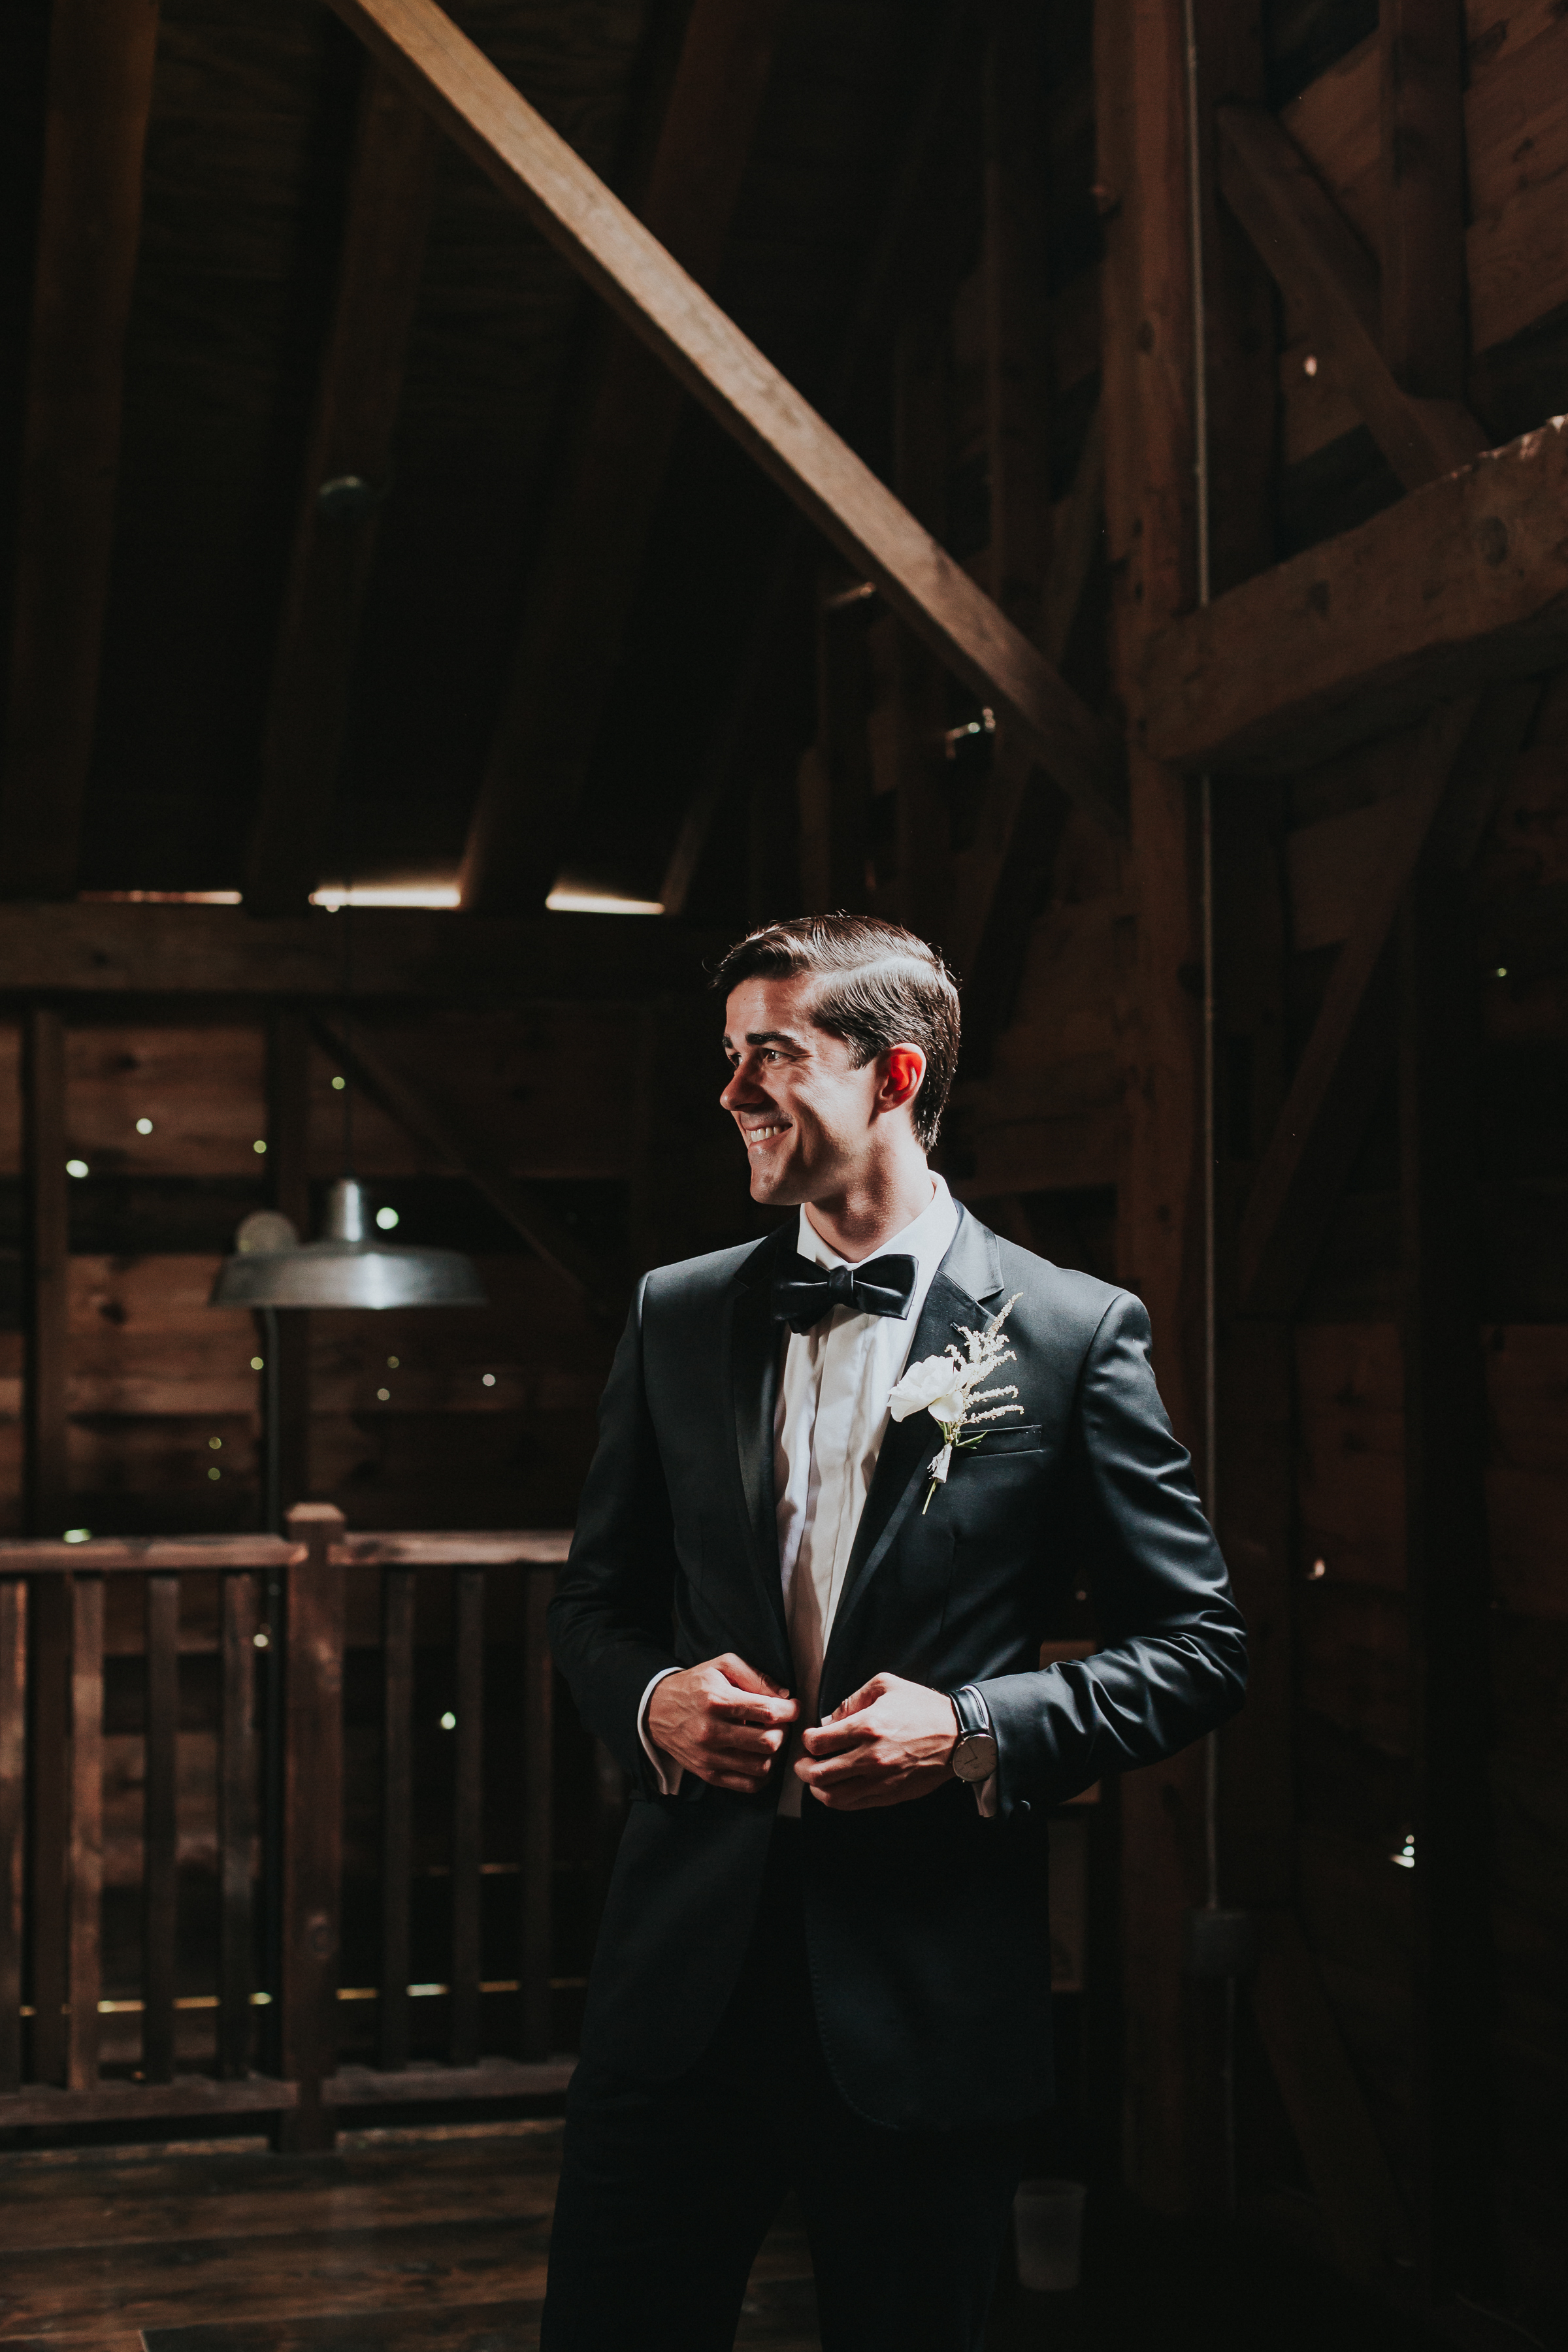 Handsome-Hollow-Long-Eddy-Catskills-New-York-Fine-Art-Documentary-Wedding-Photographer-23.jpg